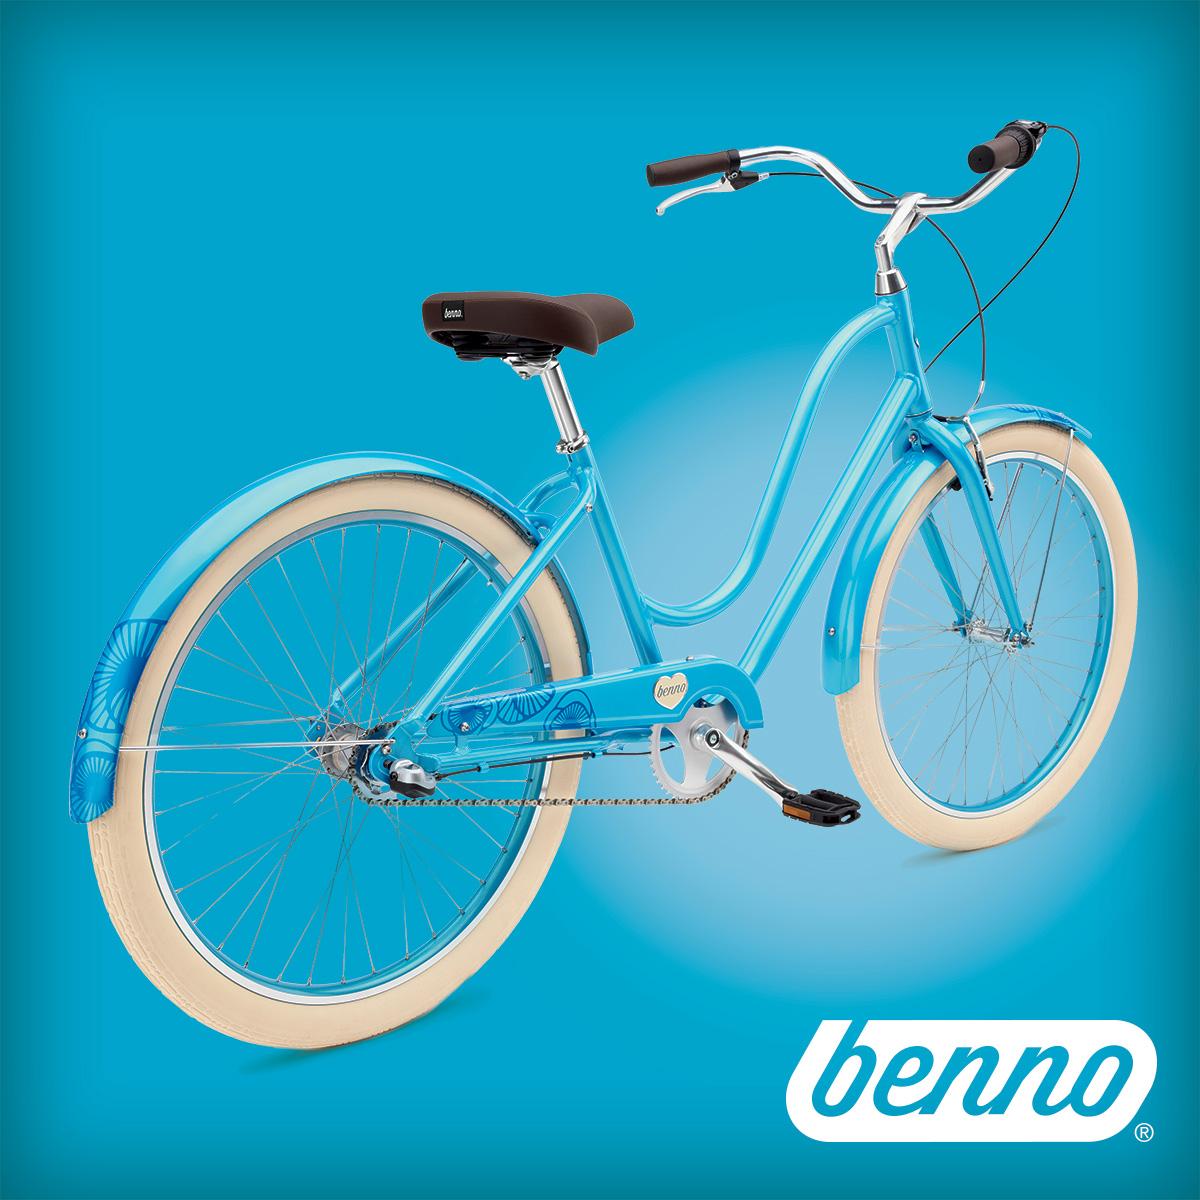 Benno_Upright_3i_Ladies_Sky_Blue_Angle.jpg